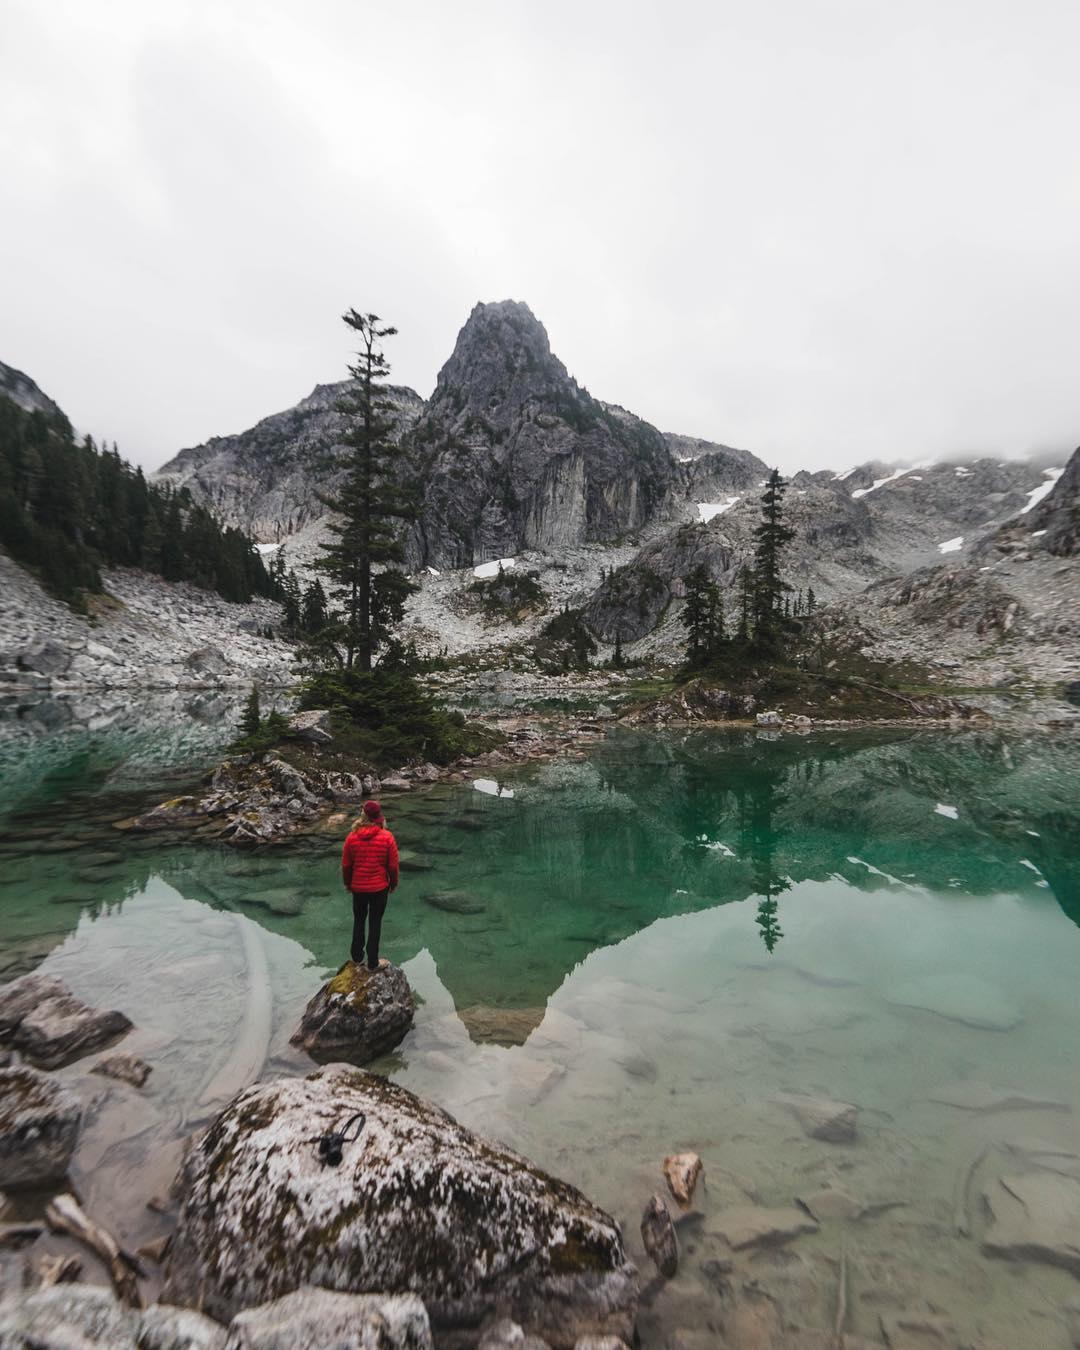 Путешествия и приключения на снимках Эррин Касано